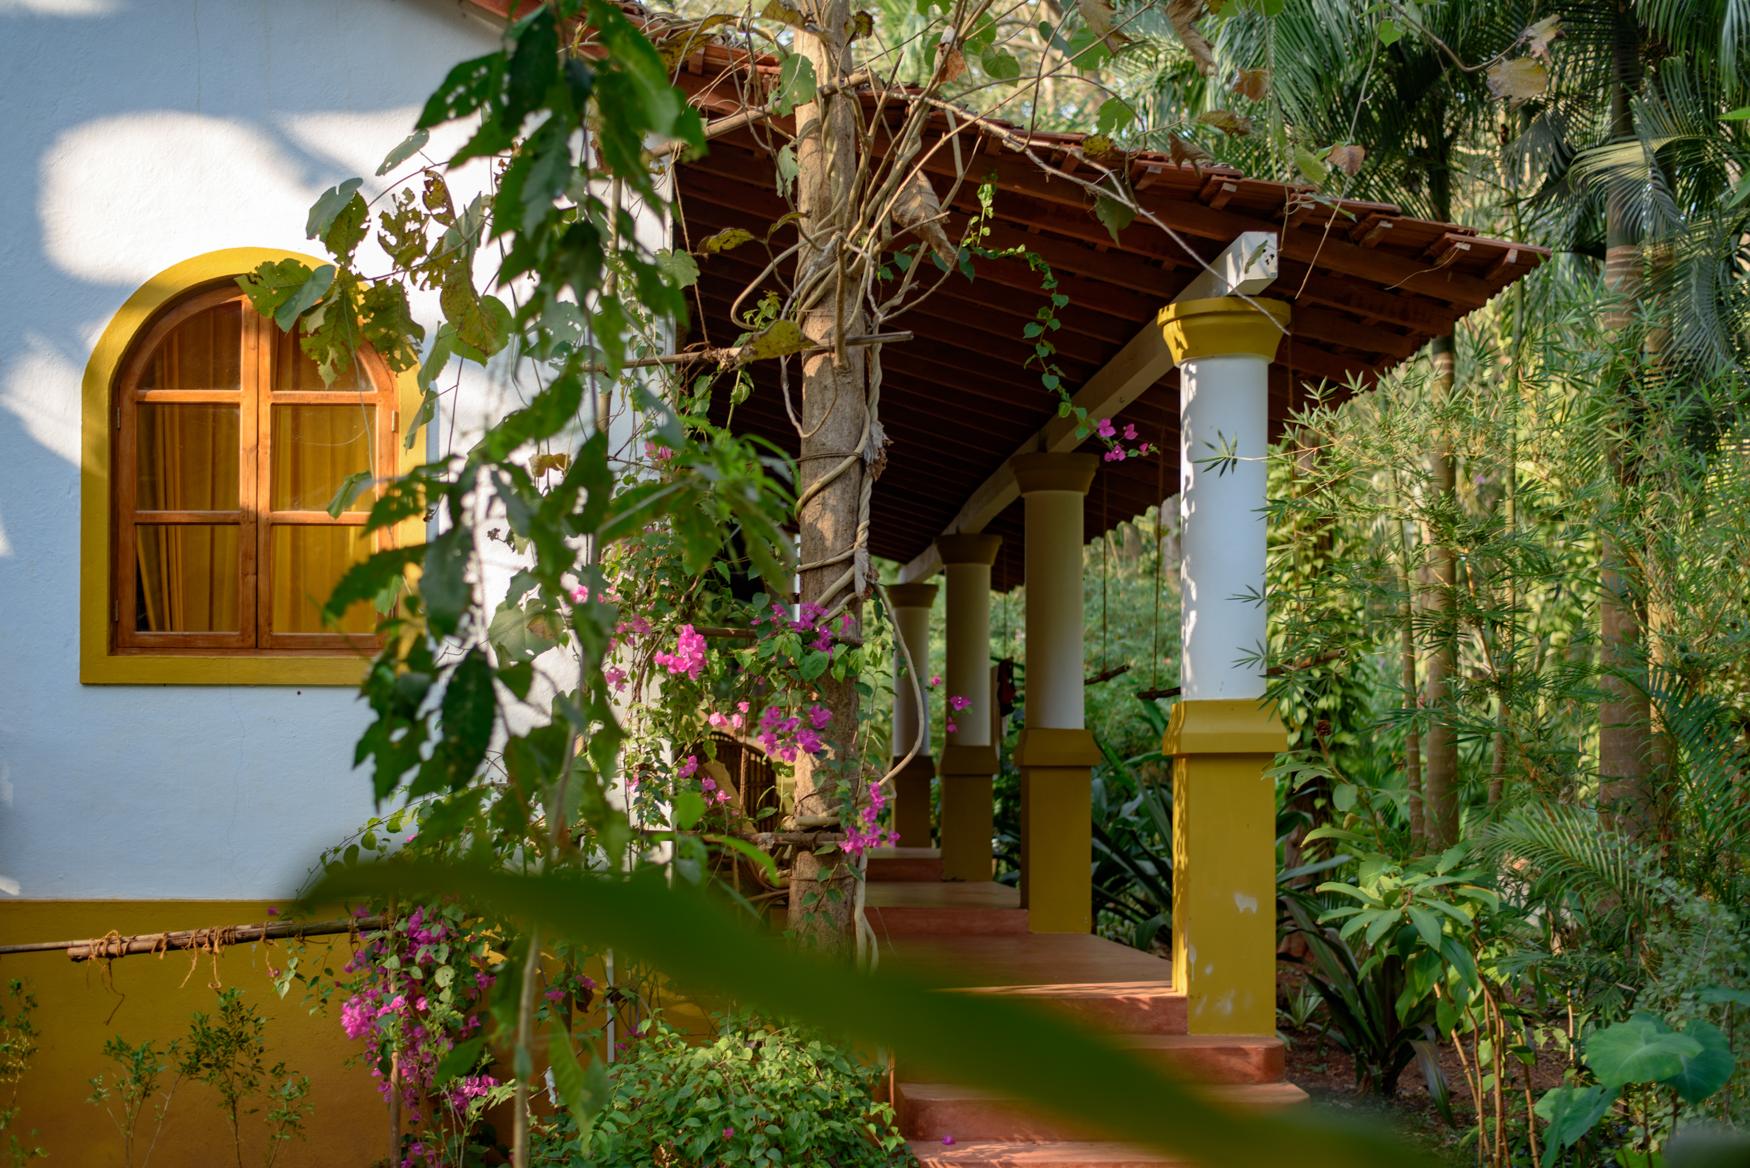 Yoga-Retreat-Photography-Costa-Rica-56.jpg